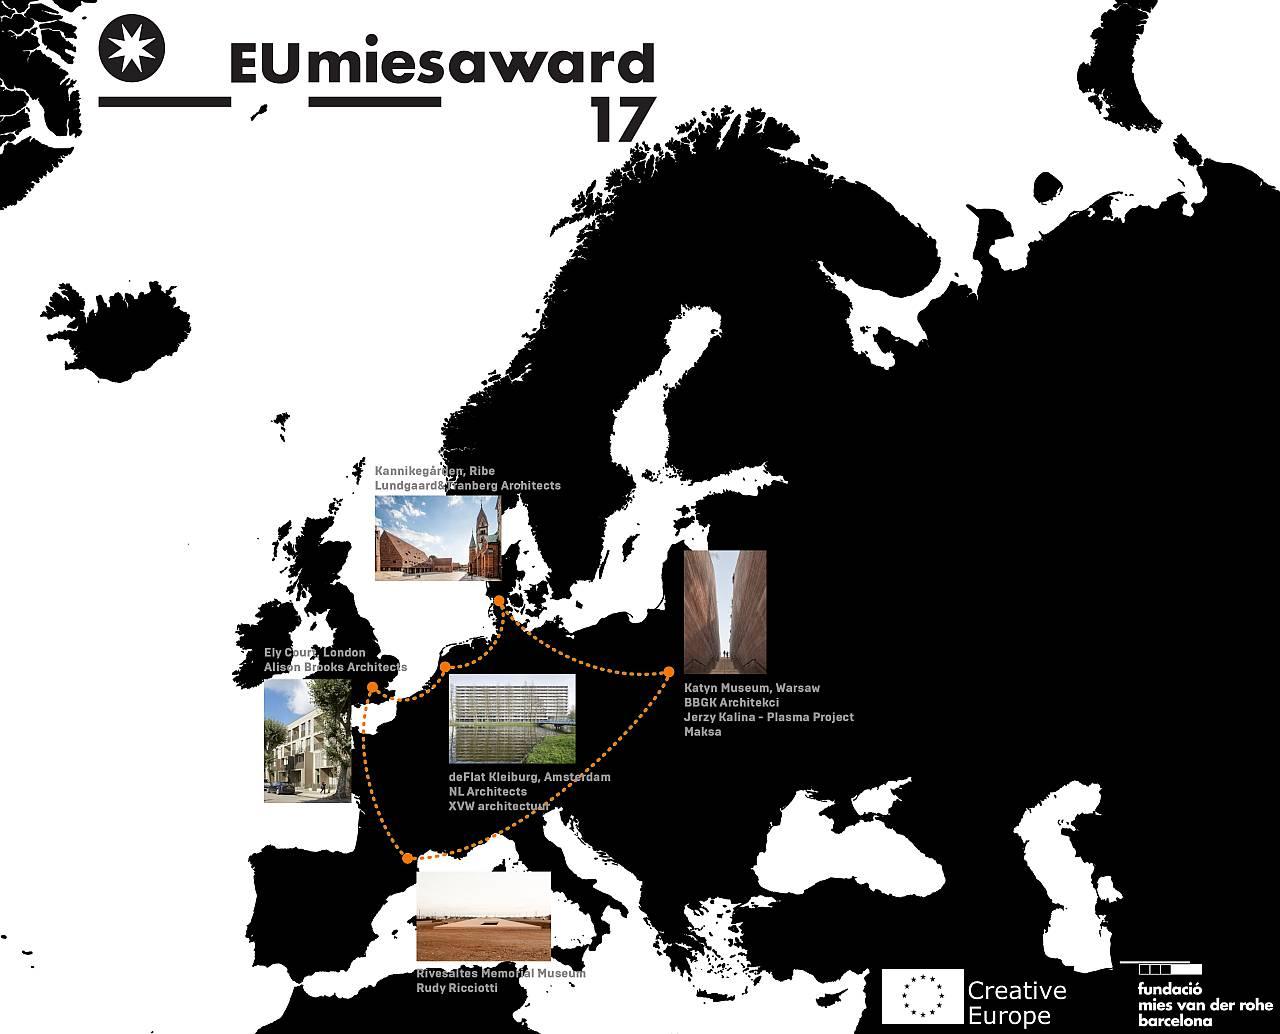 EU MIES AWARD TALKS: Serie de Conferencias Finalistas del Premio EU Mies Award 2017 : Imagen © Premio EU Mies Award